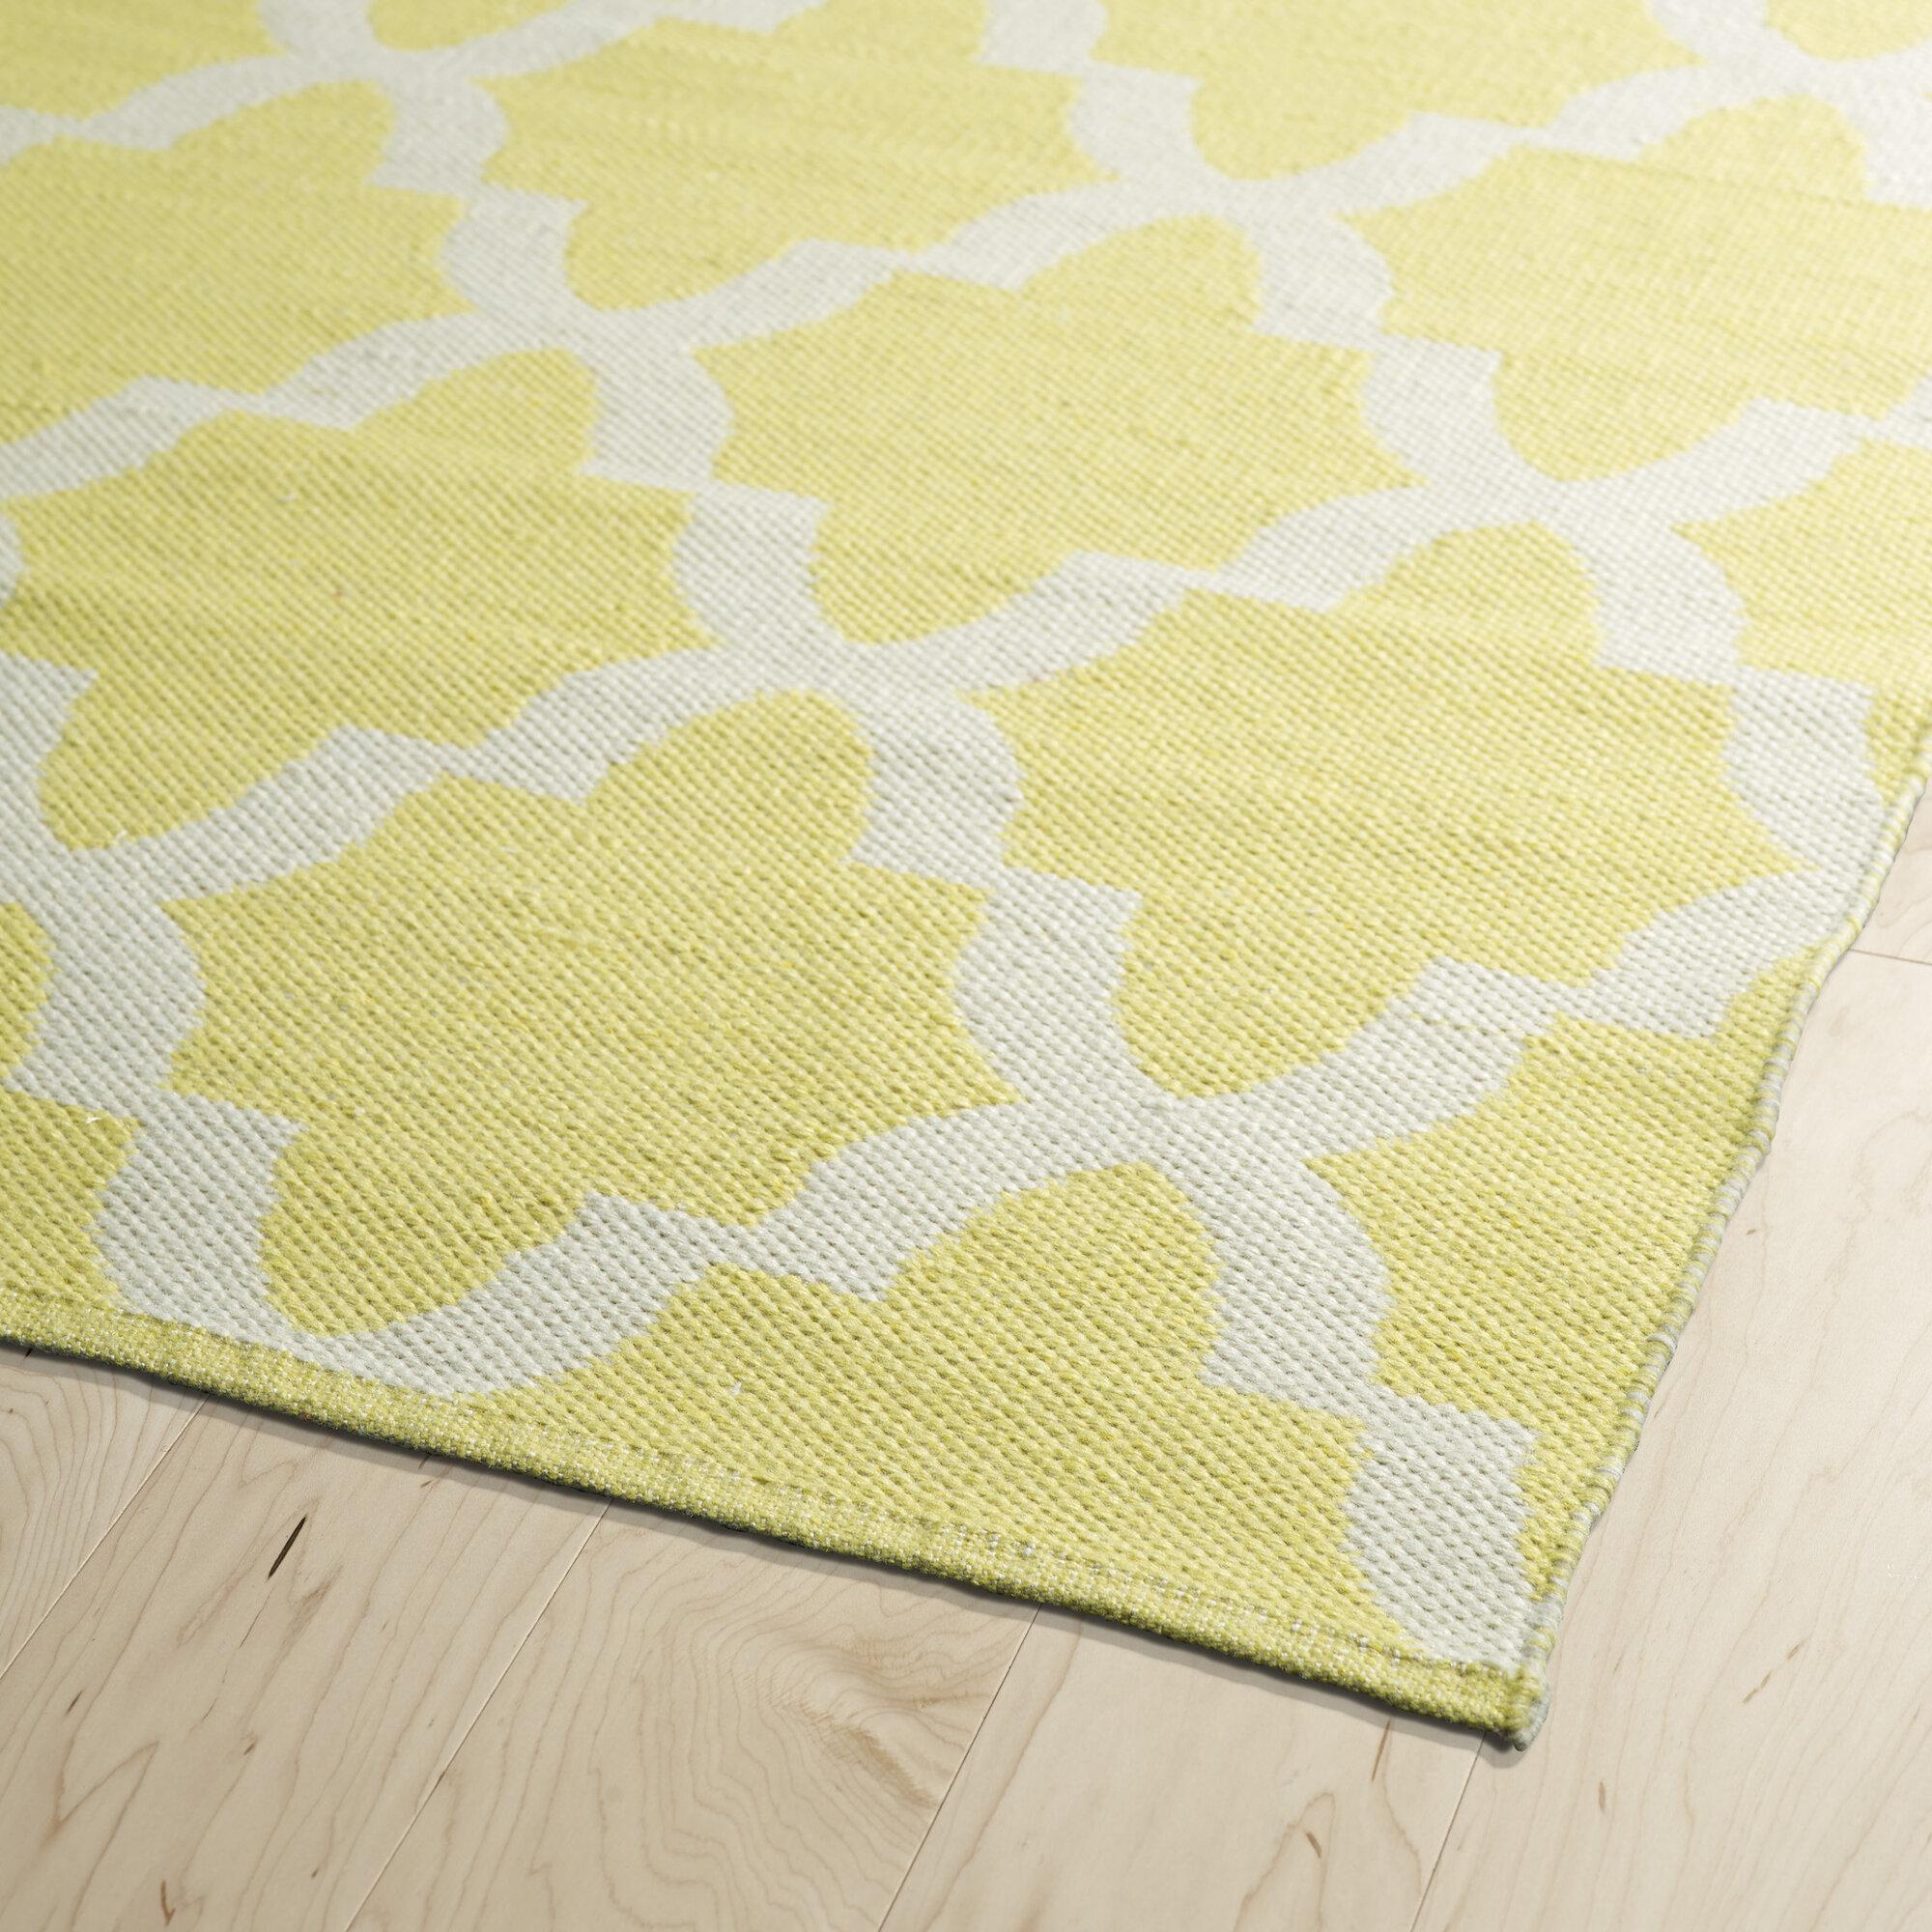 kaleen brisa yellow white indoor outdoor area rug ebay. Black Bedroom Furniture Sets. Home Design Ideas